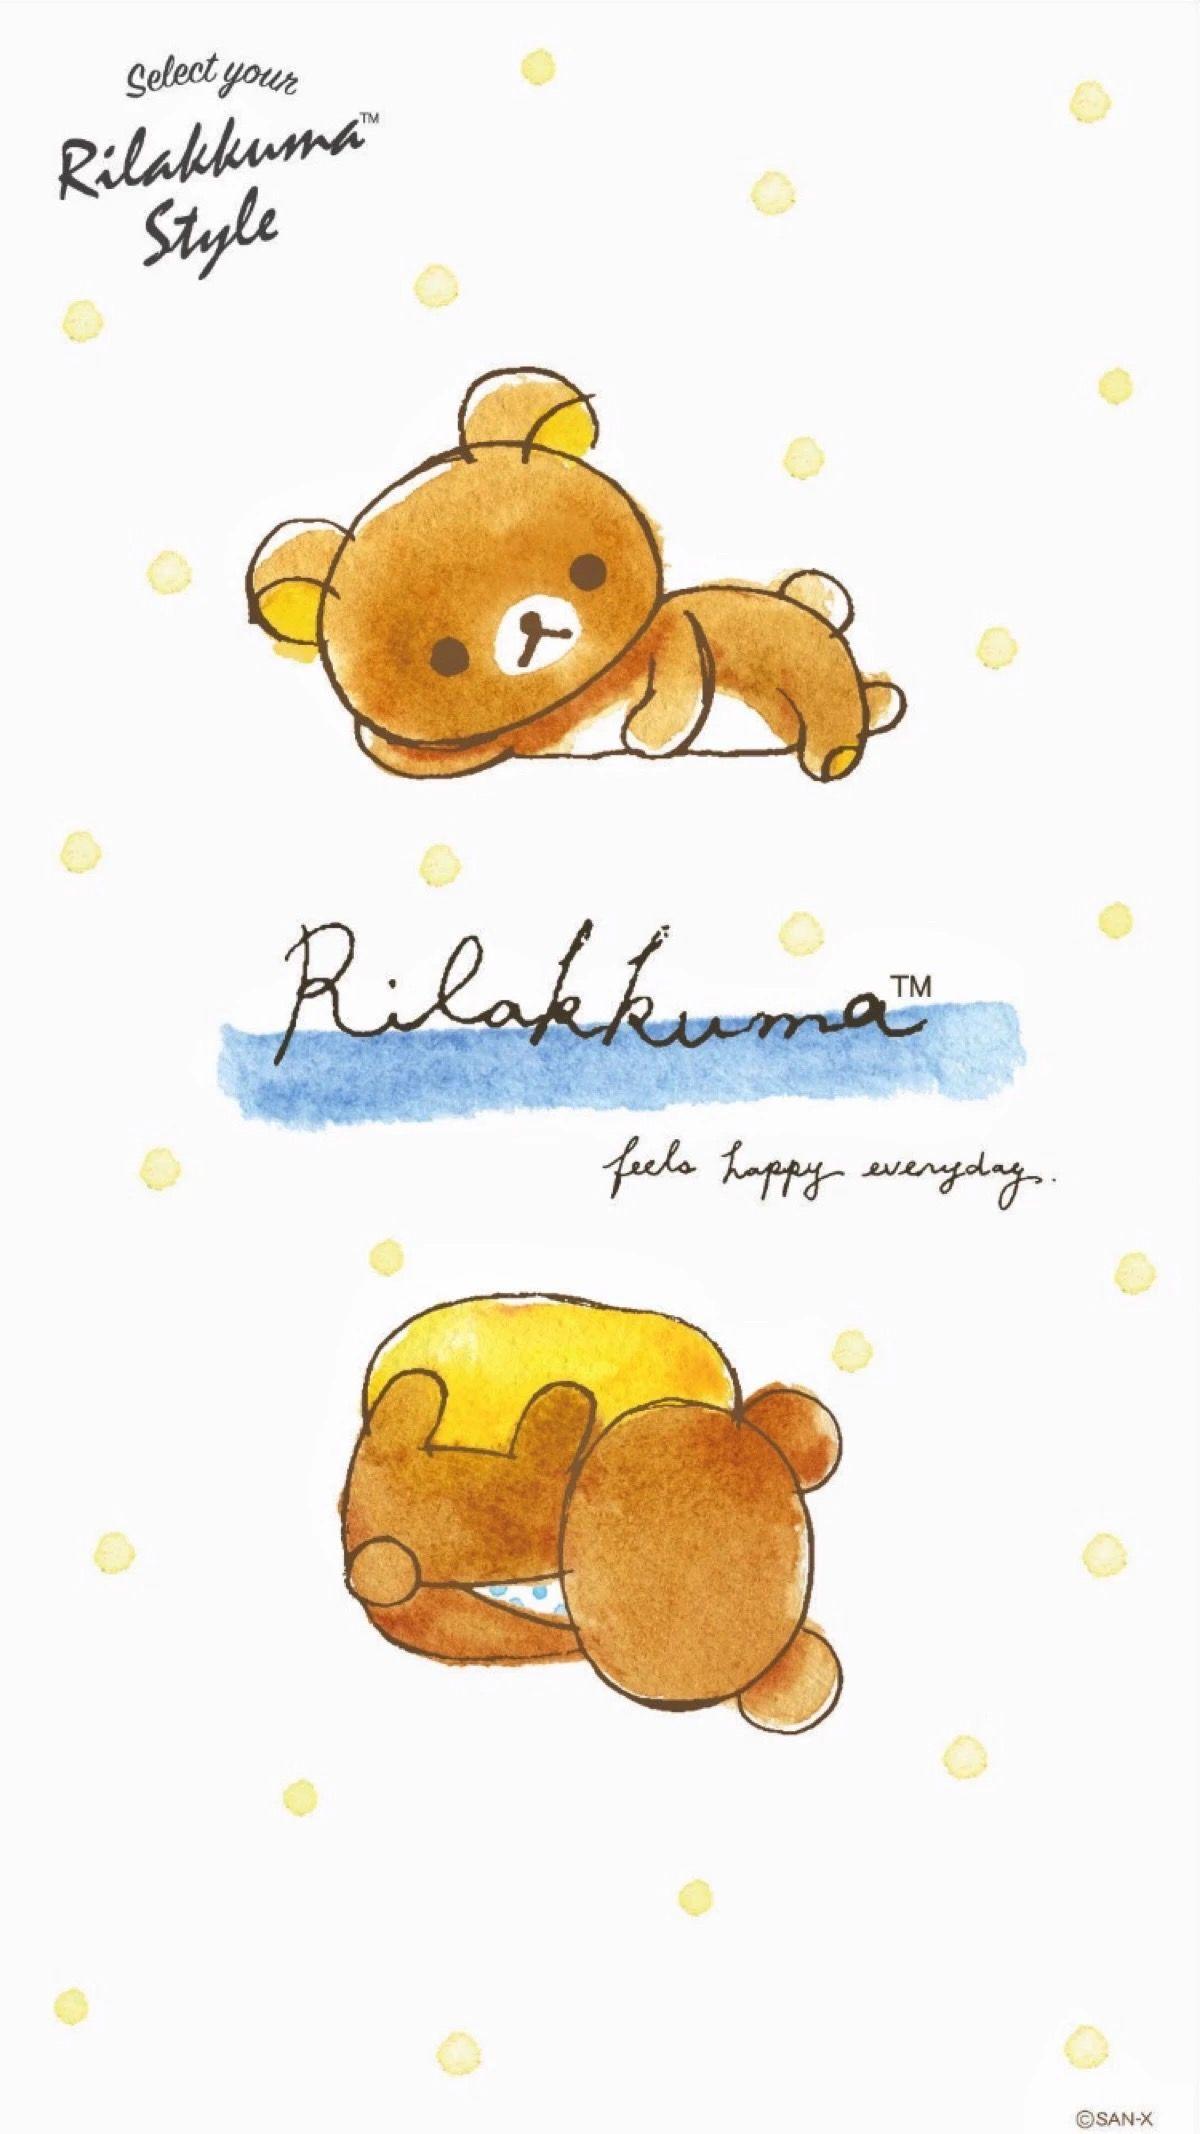 Cute Images Cute Pictures Aphmau Rilakkuma Wallpaper